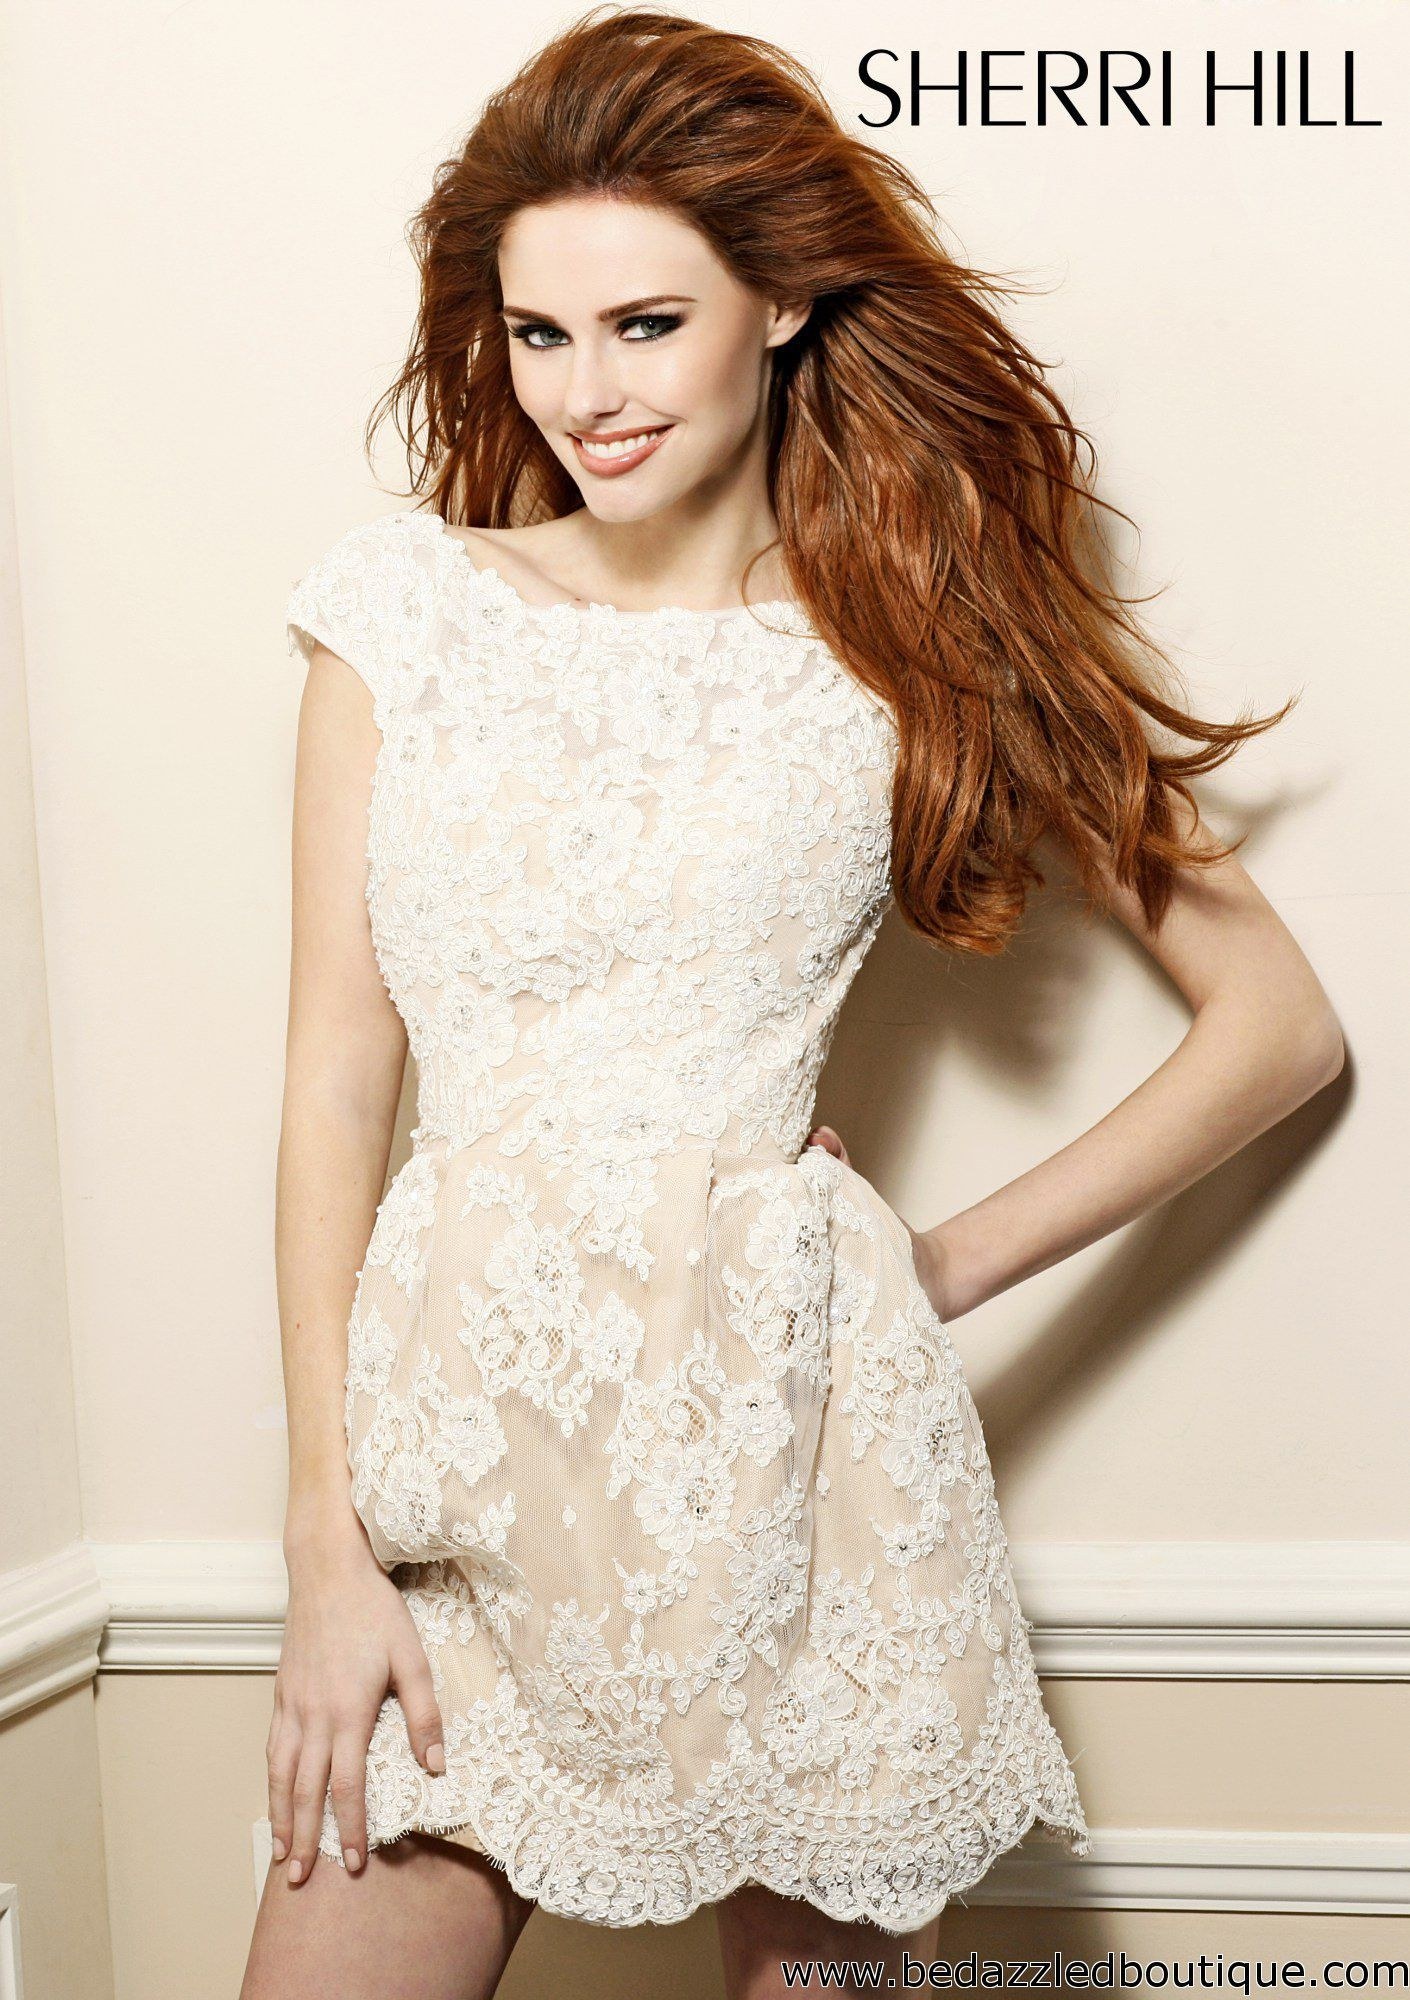 Sherri hill popping prom dresses pinterest sherri hill